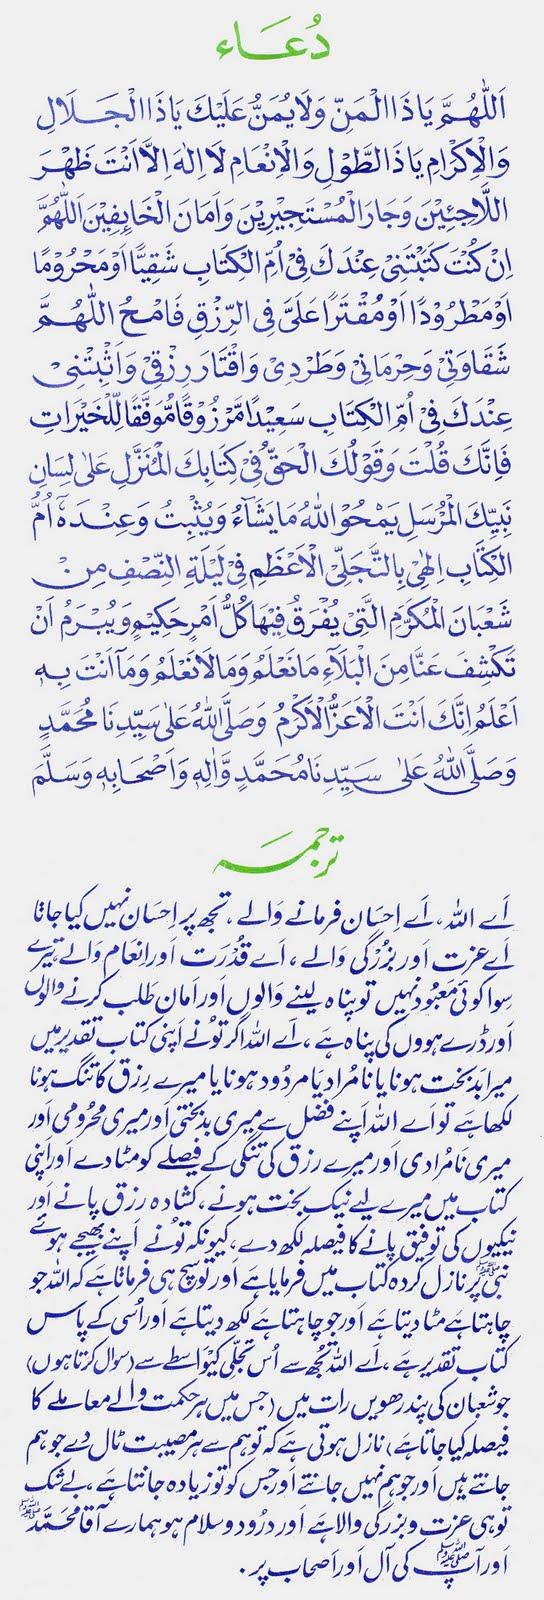 Shabe-e-Barat-15-shabaan-night-dua-prayer-jpg